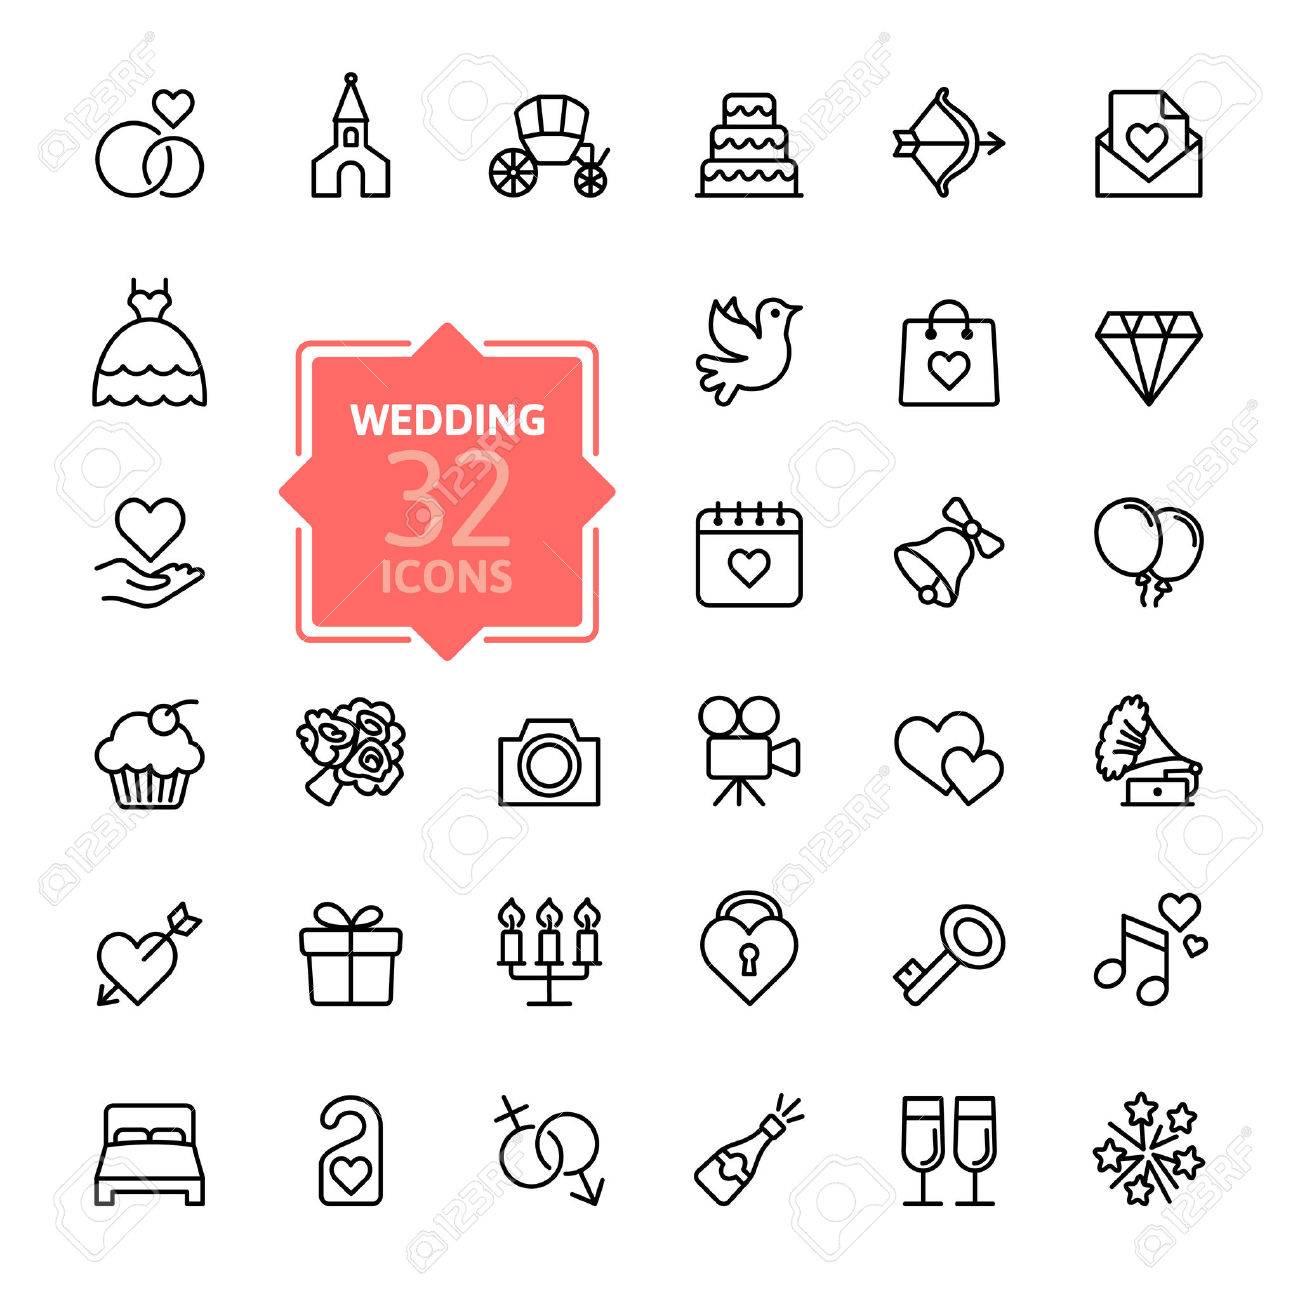 Outline web icon set wedding Stock Vector - 39592913